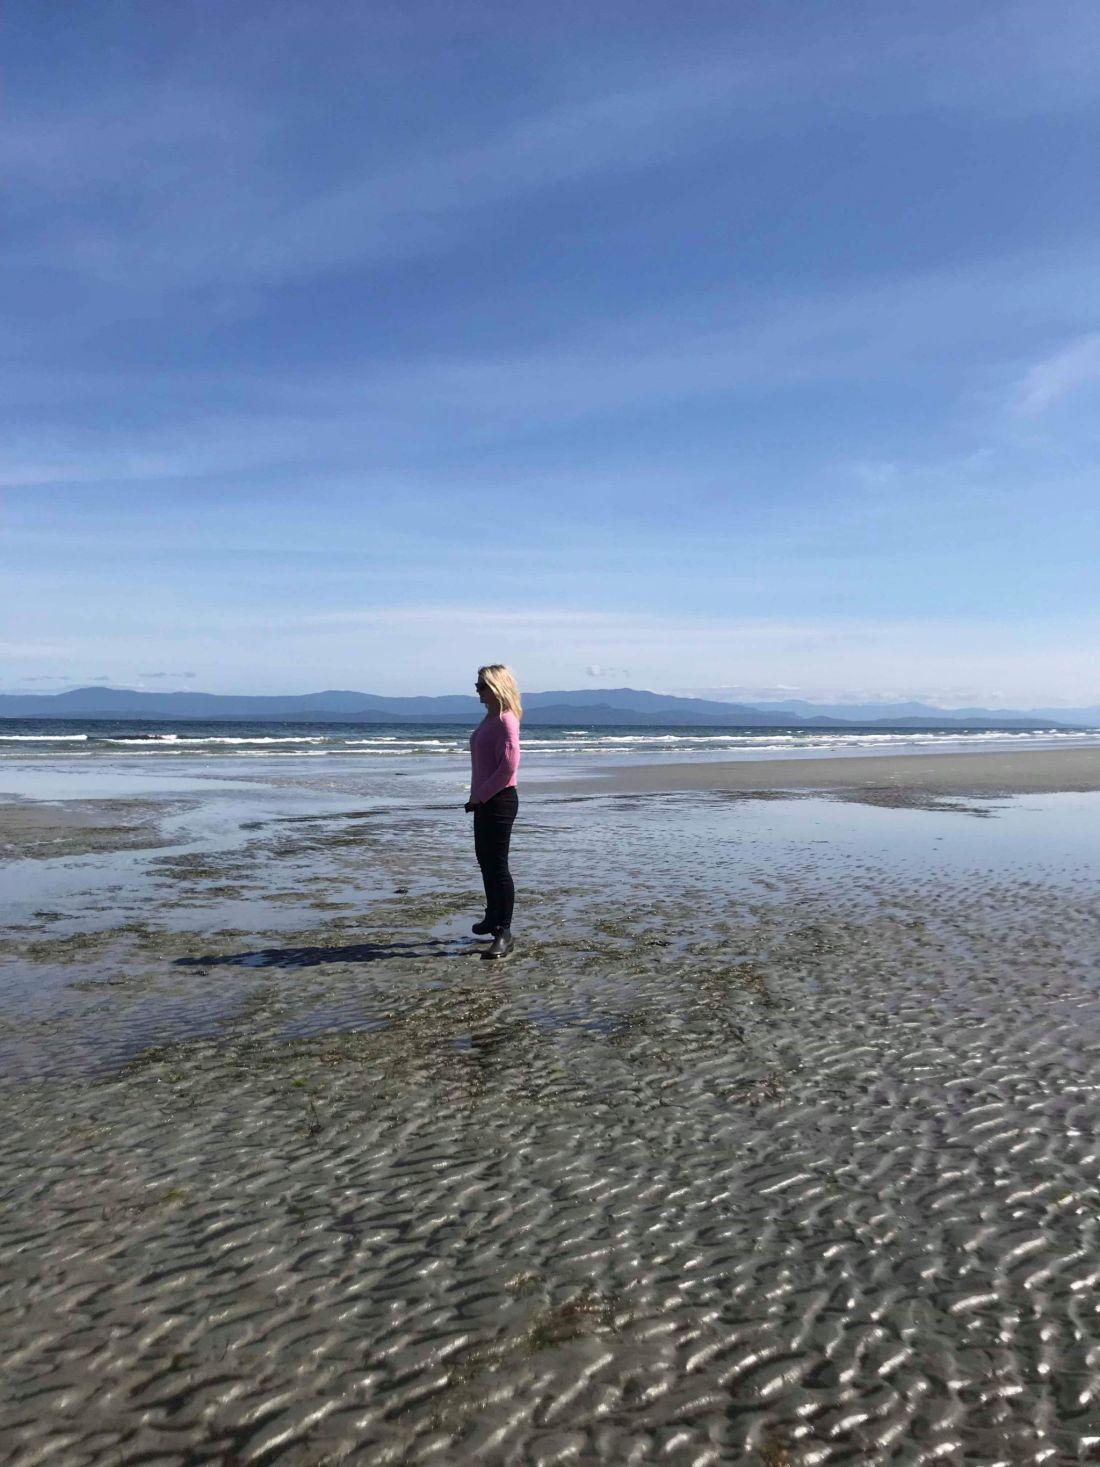 Laura on Qualicum Beach, Vancouver Island